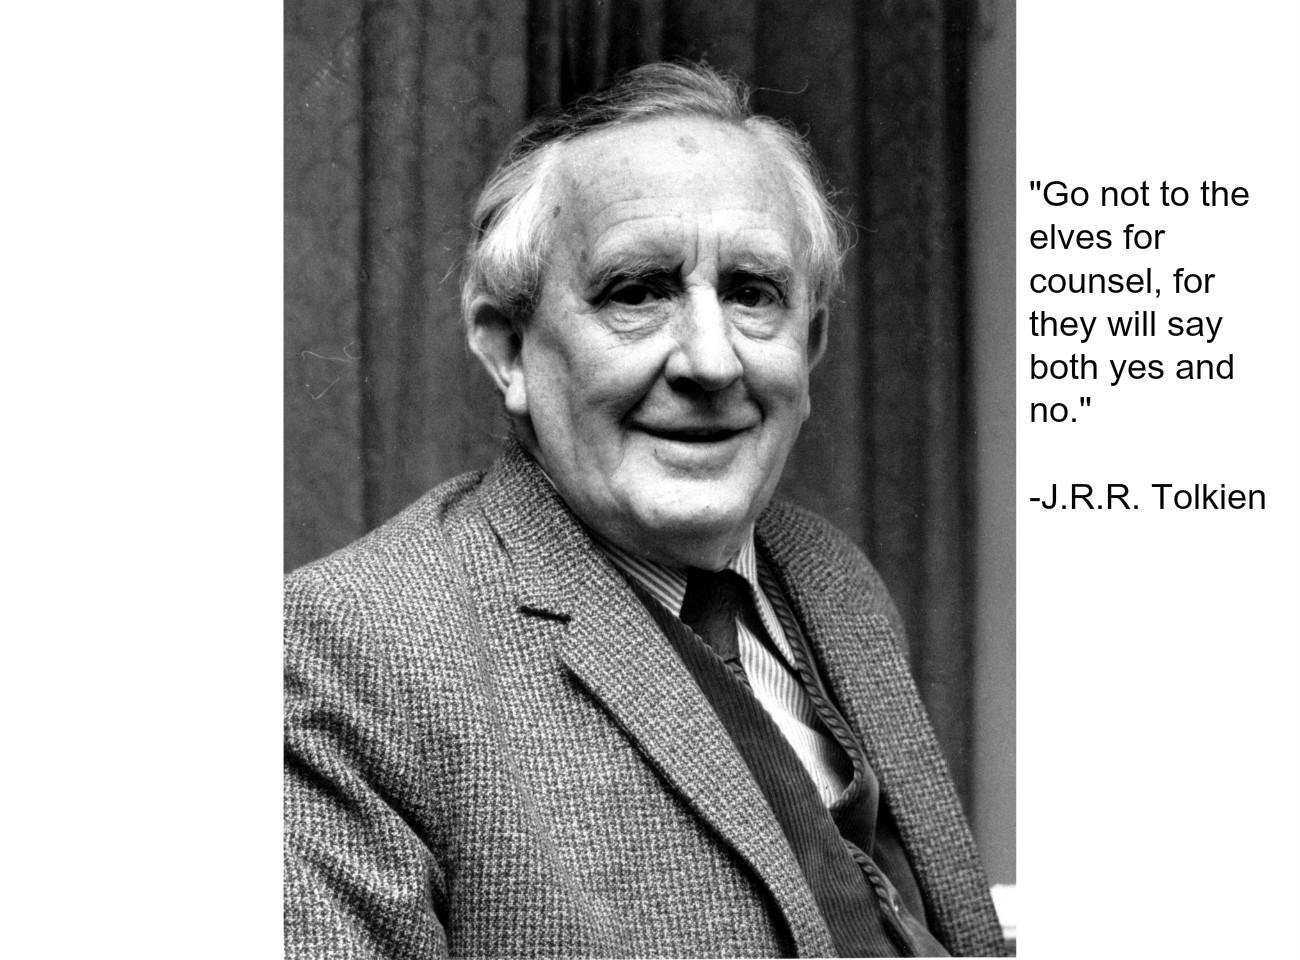 J R R J. R. R. Tolkien Quote...